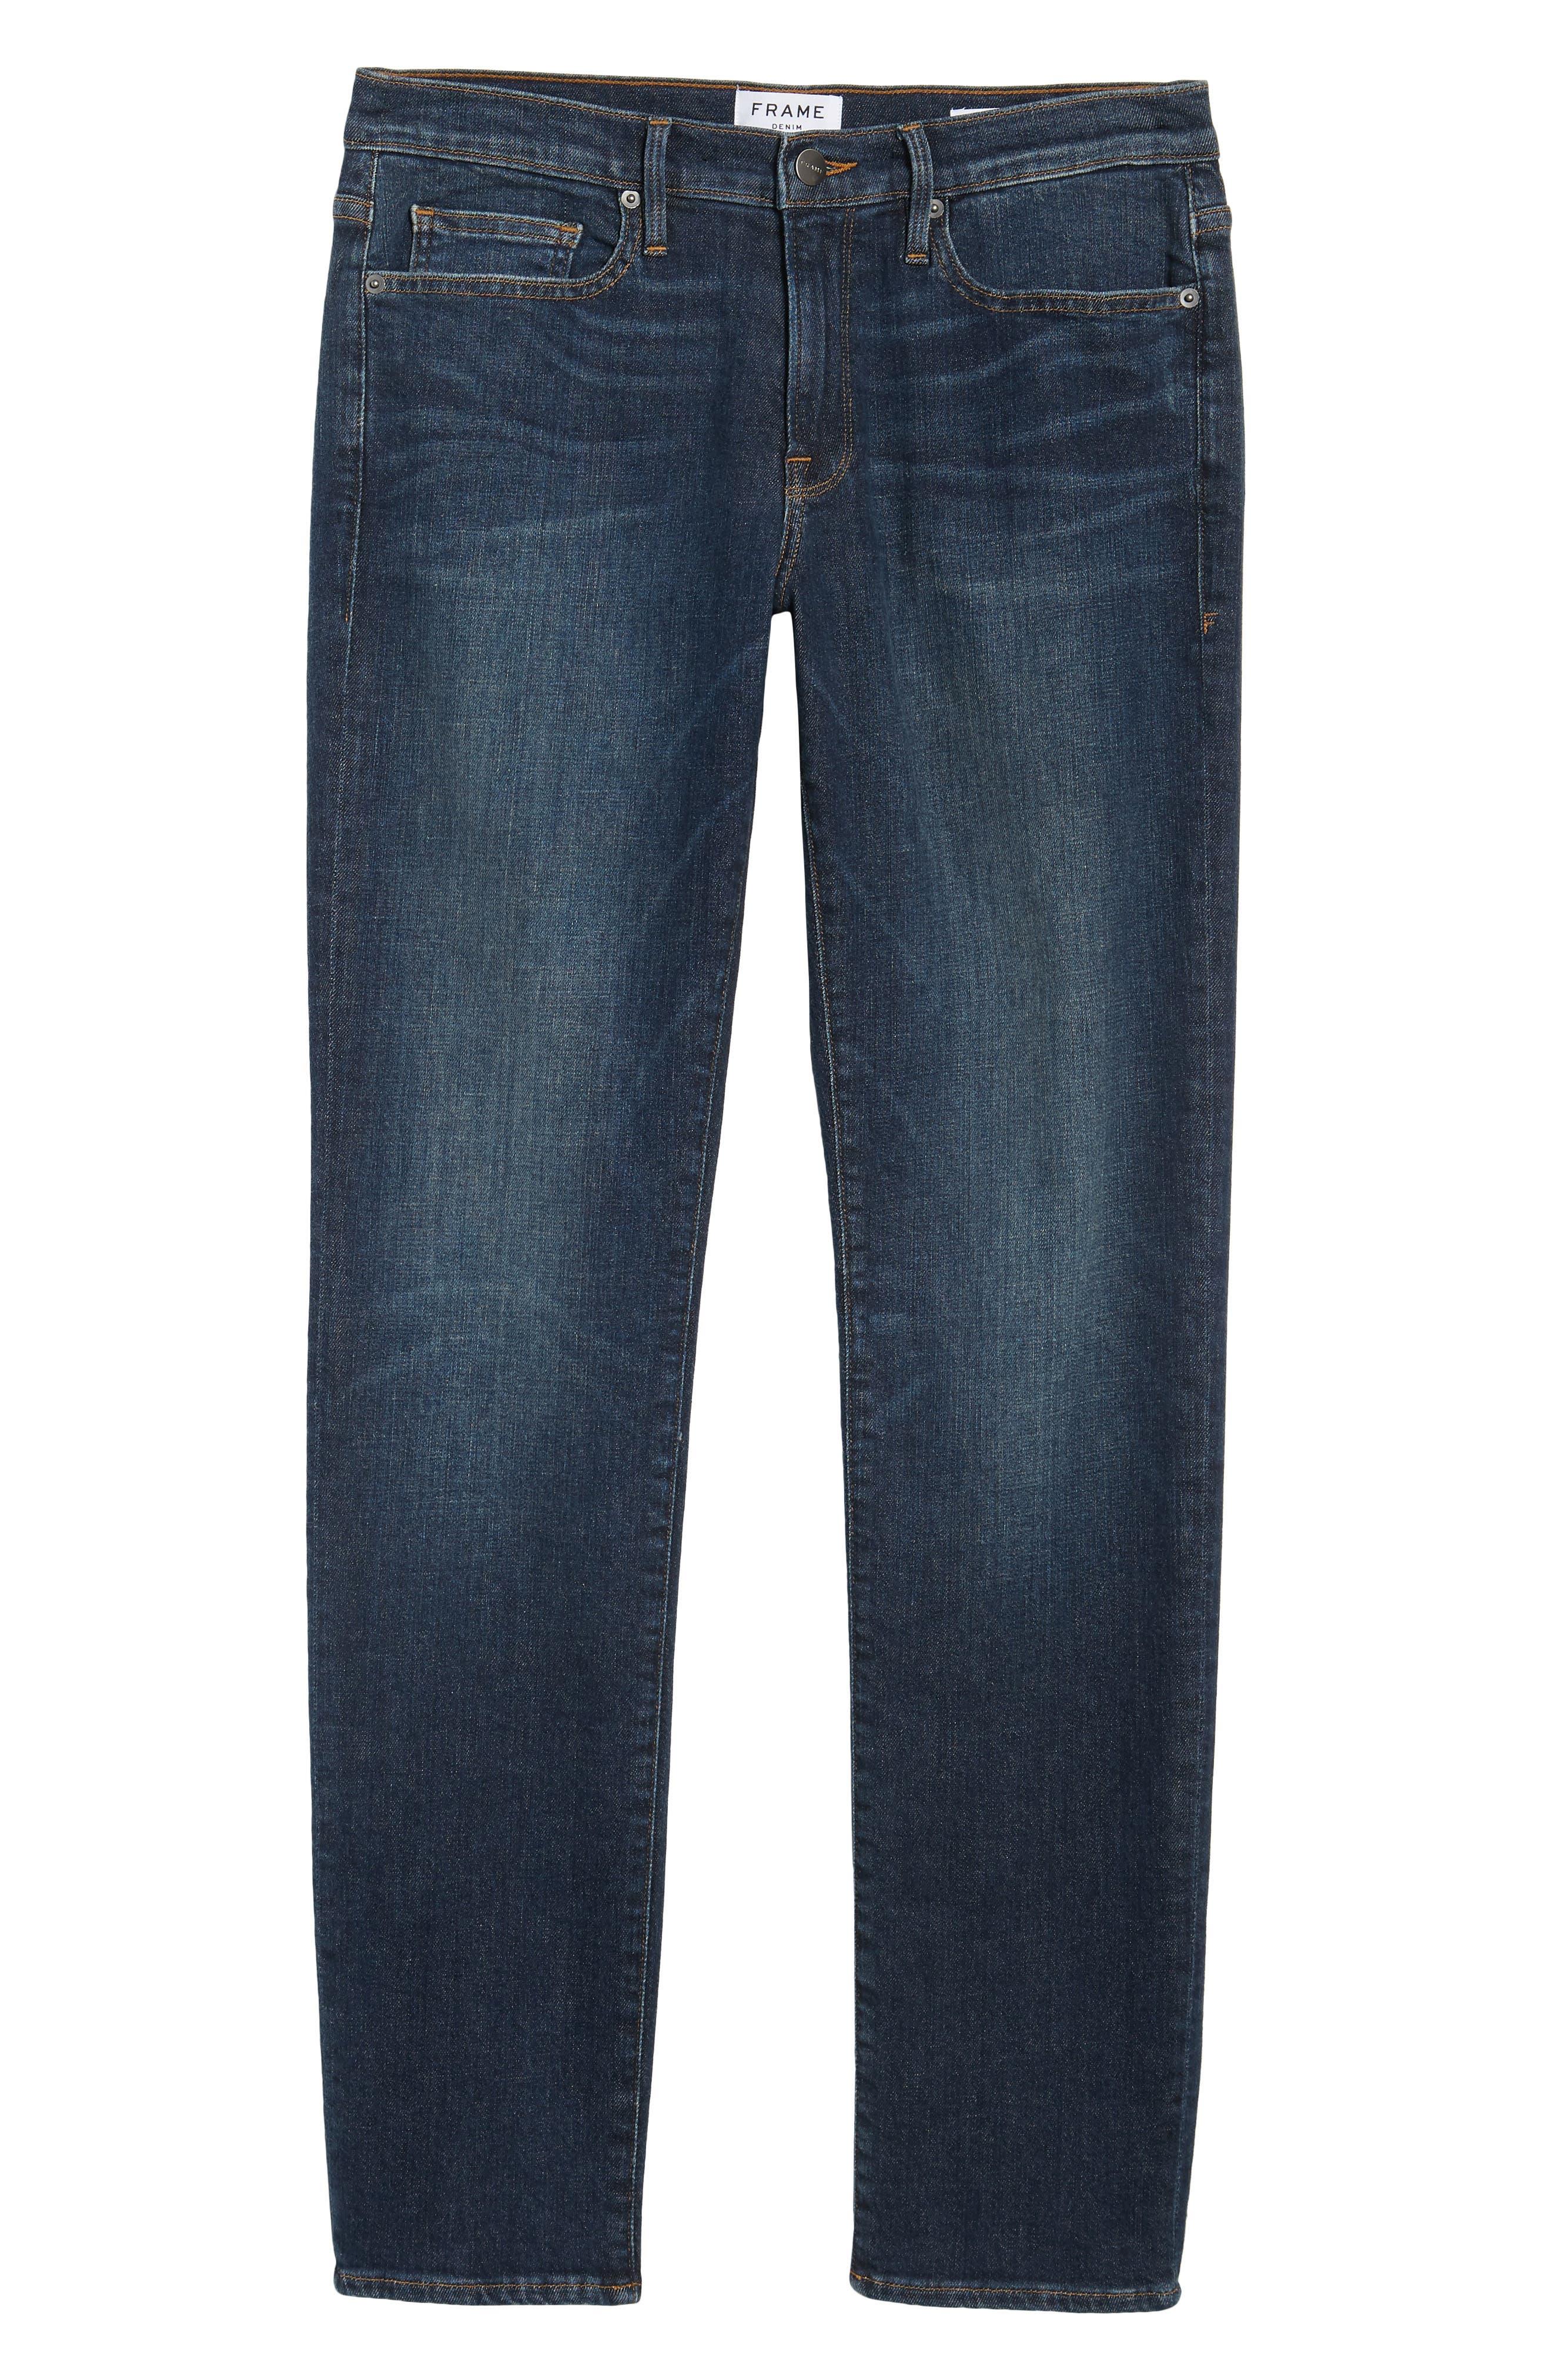 L'Homme Slim Fit Jeans,                             Alternate thumbnail 6, color,                             JOSHUA TREE